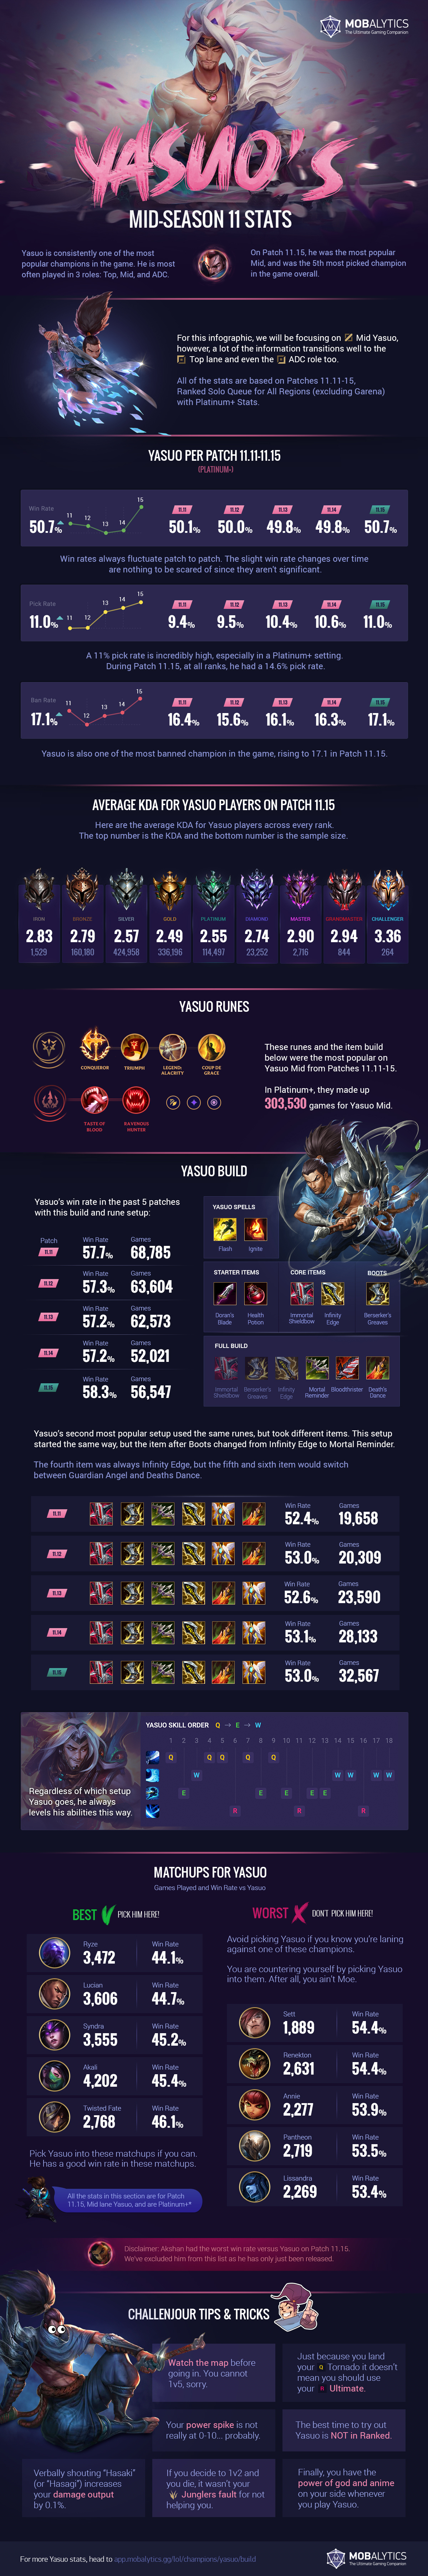 Deep Dive into Yasuo's Solo Queue Stats (Mid-Season 11) – Infographic